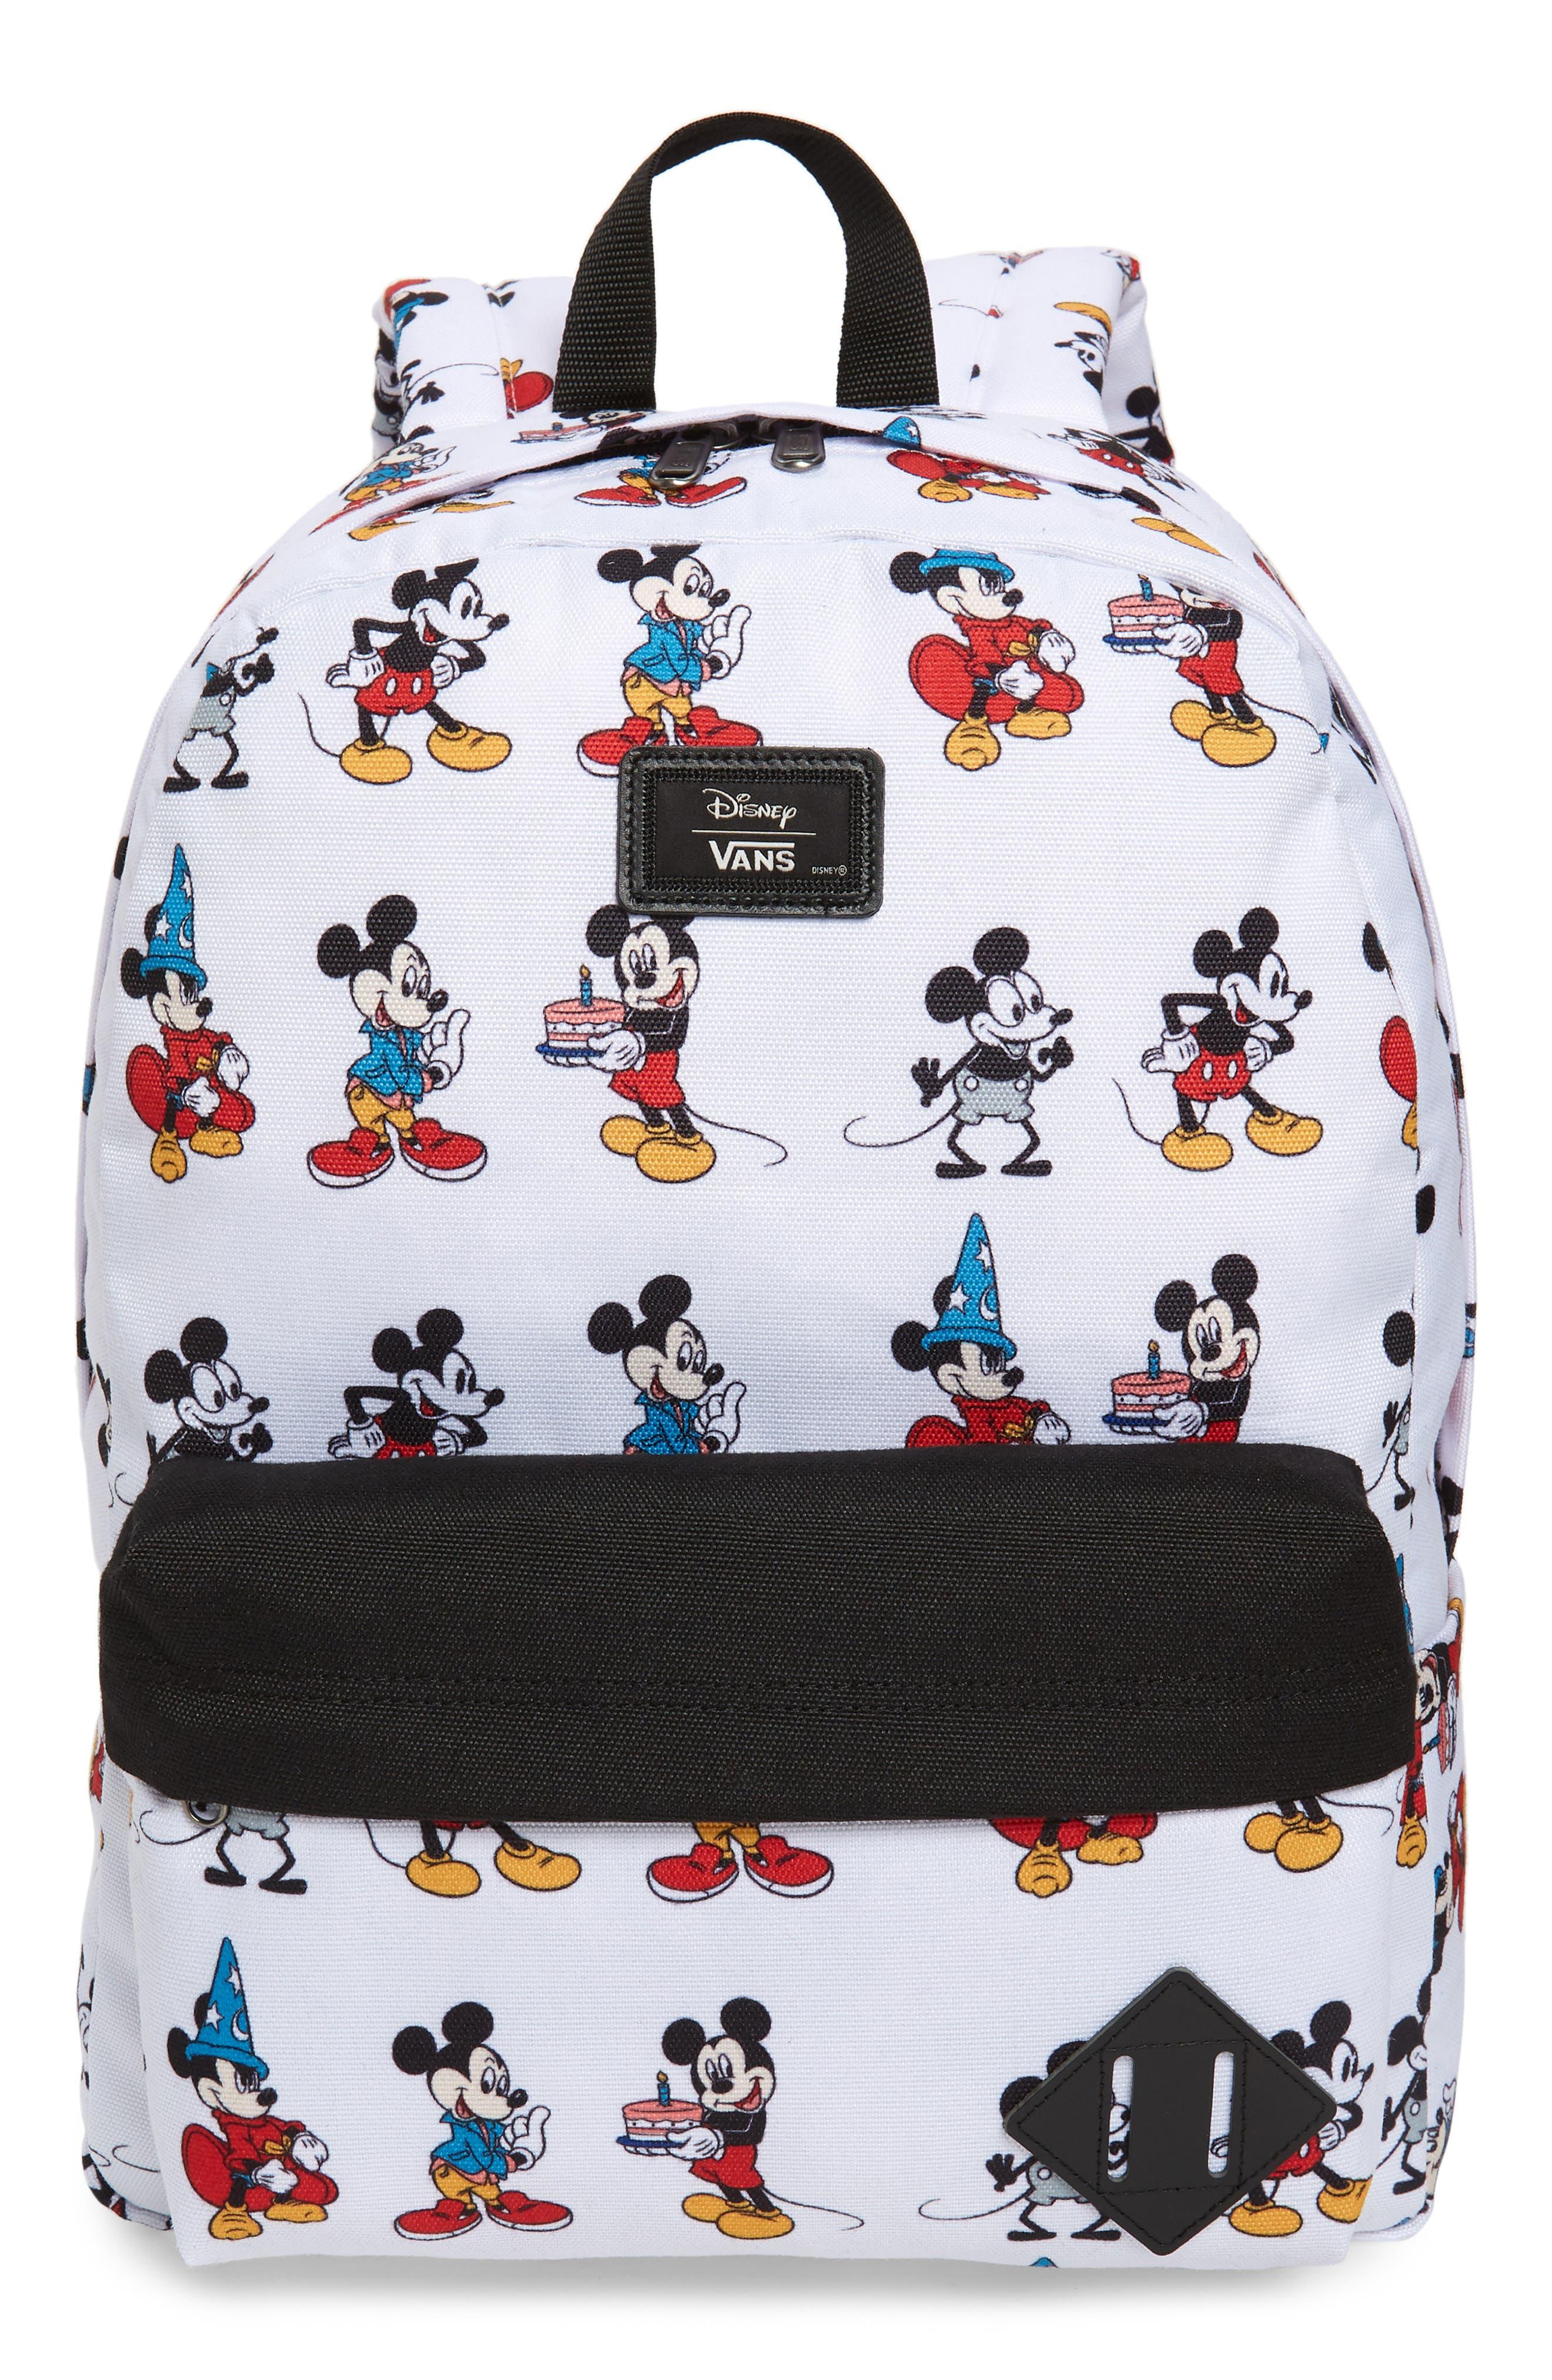 Vans x Disney Mickey's 90th Anniversary